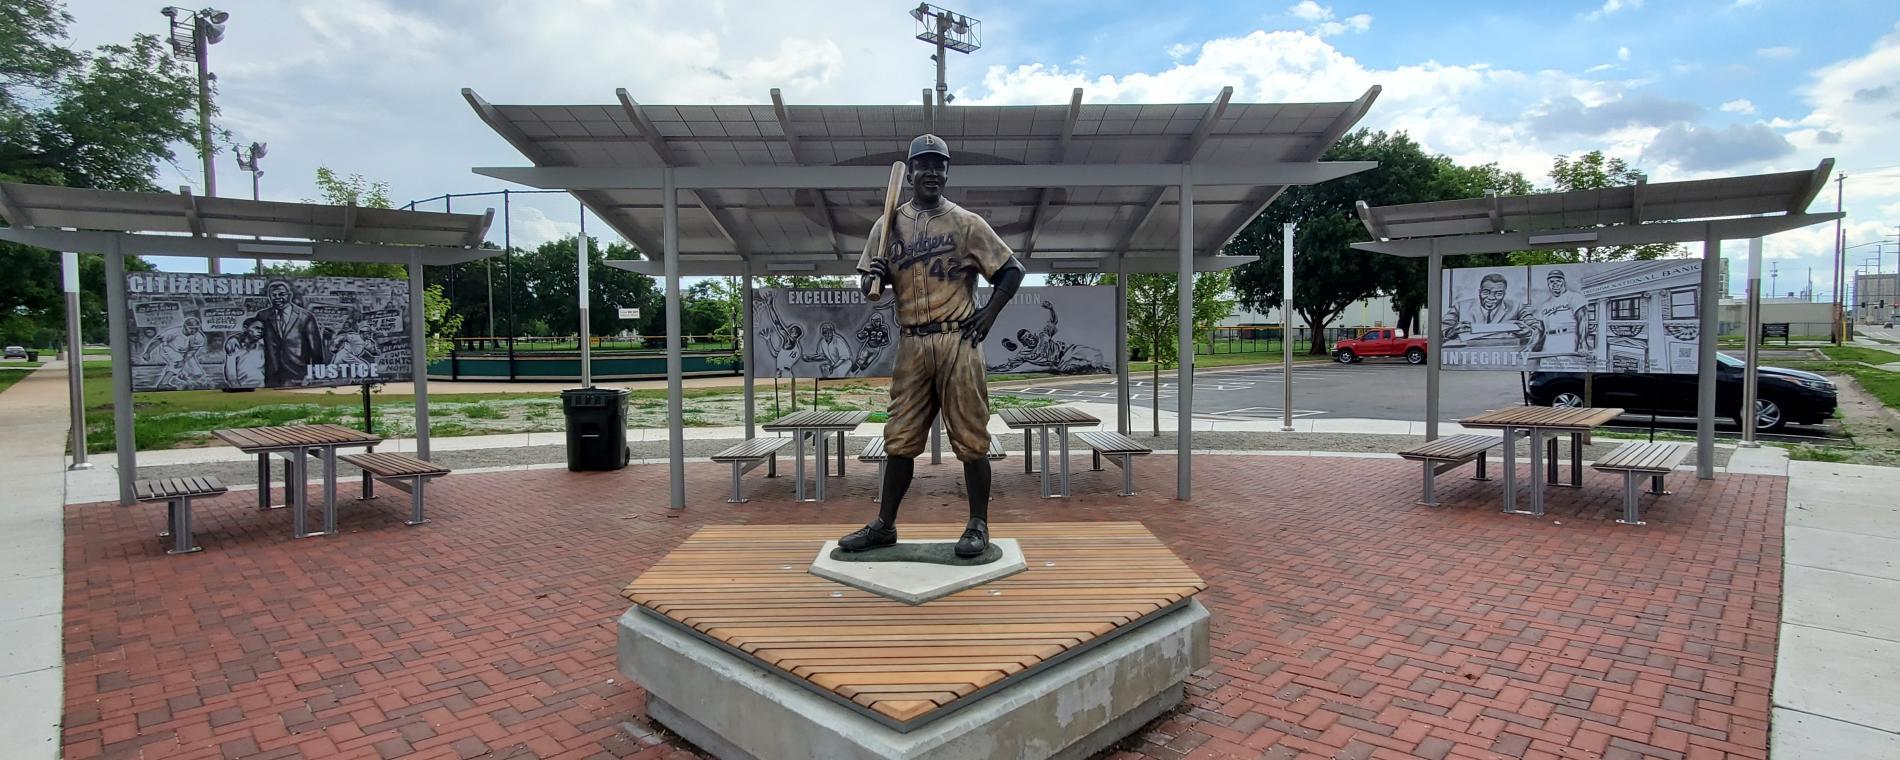 McAdams Park Robinson Statue